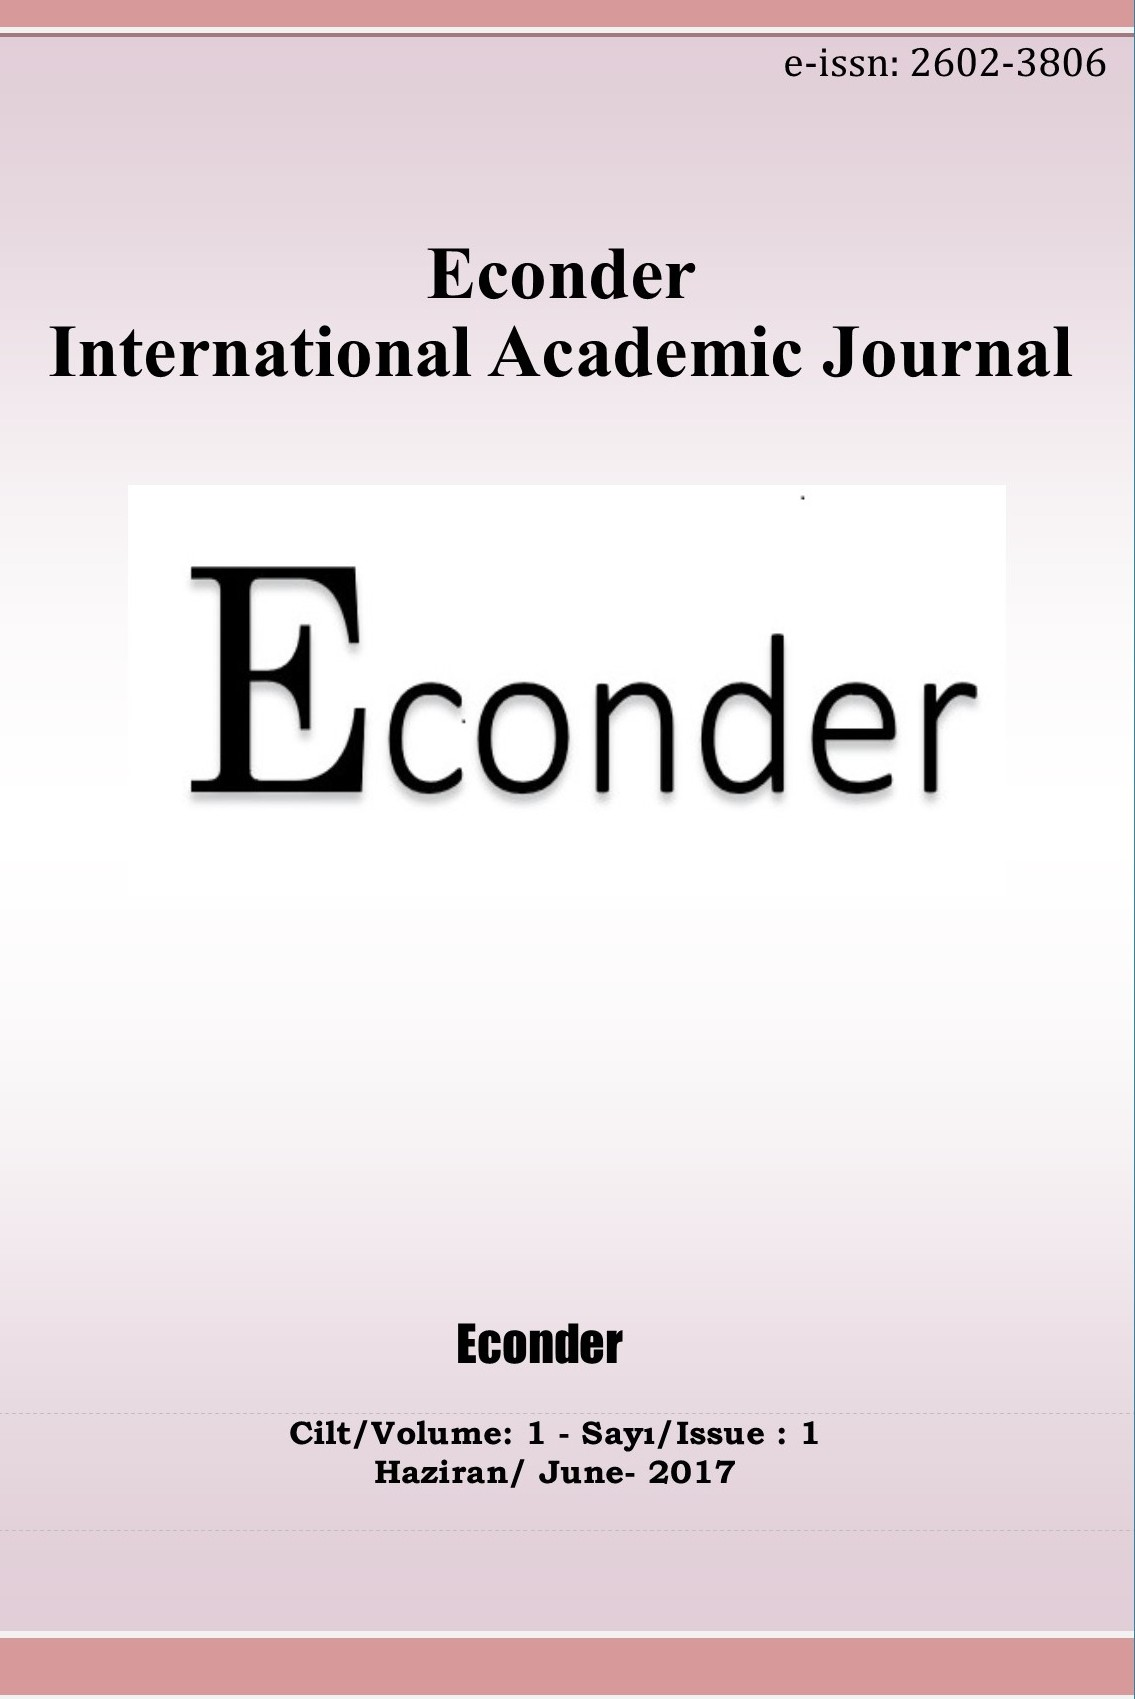 Econder International Academic Journal